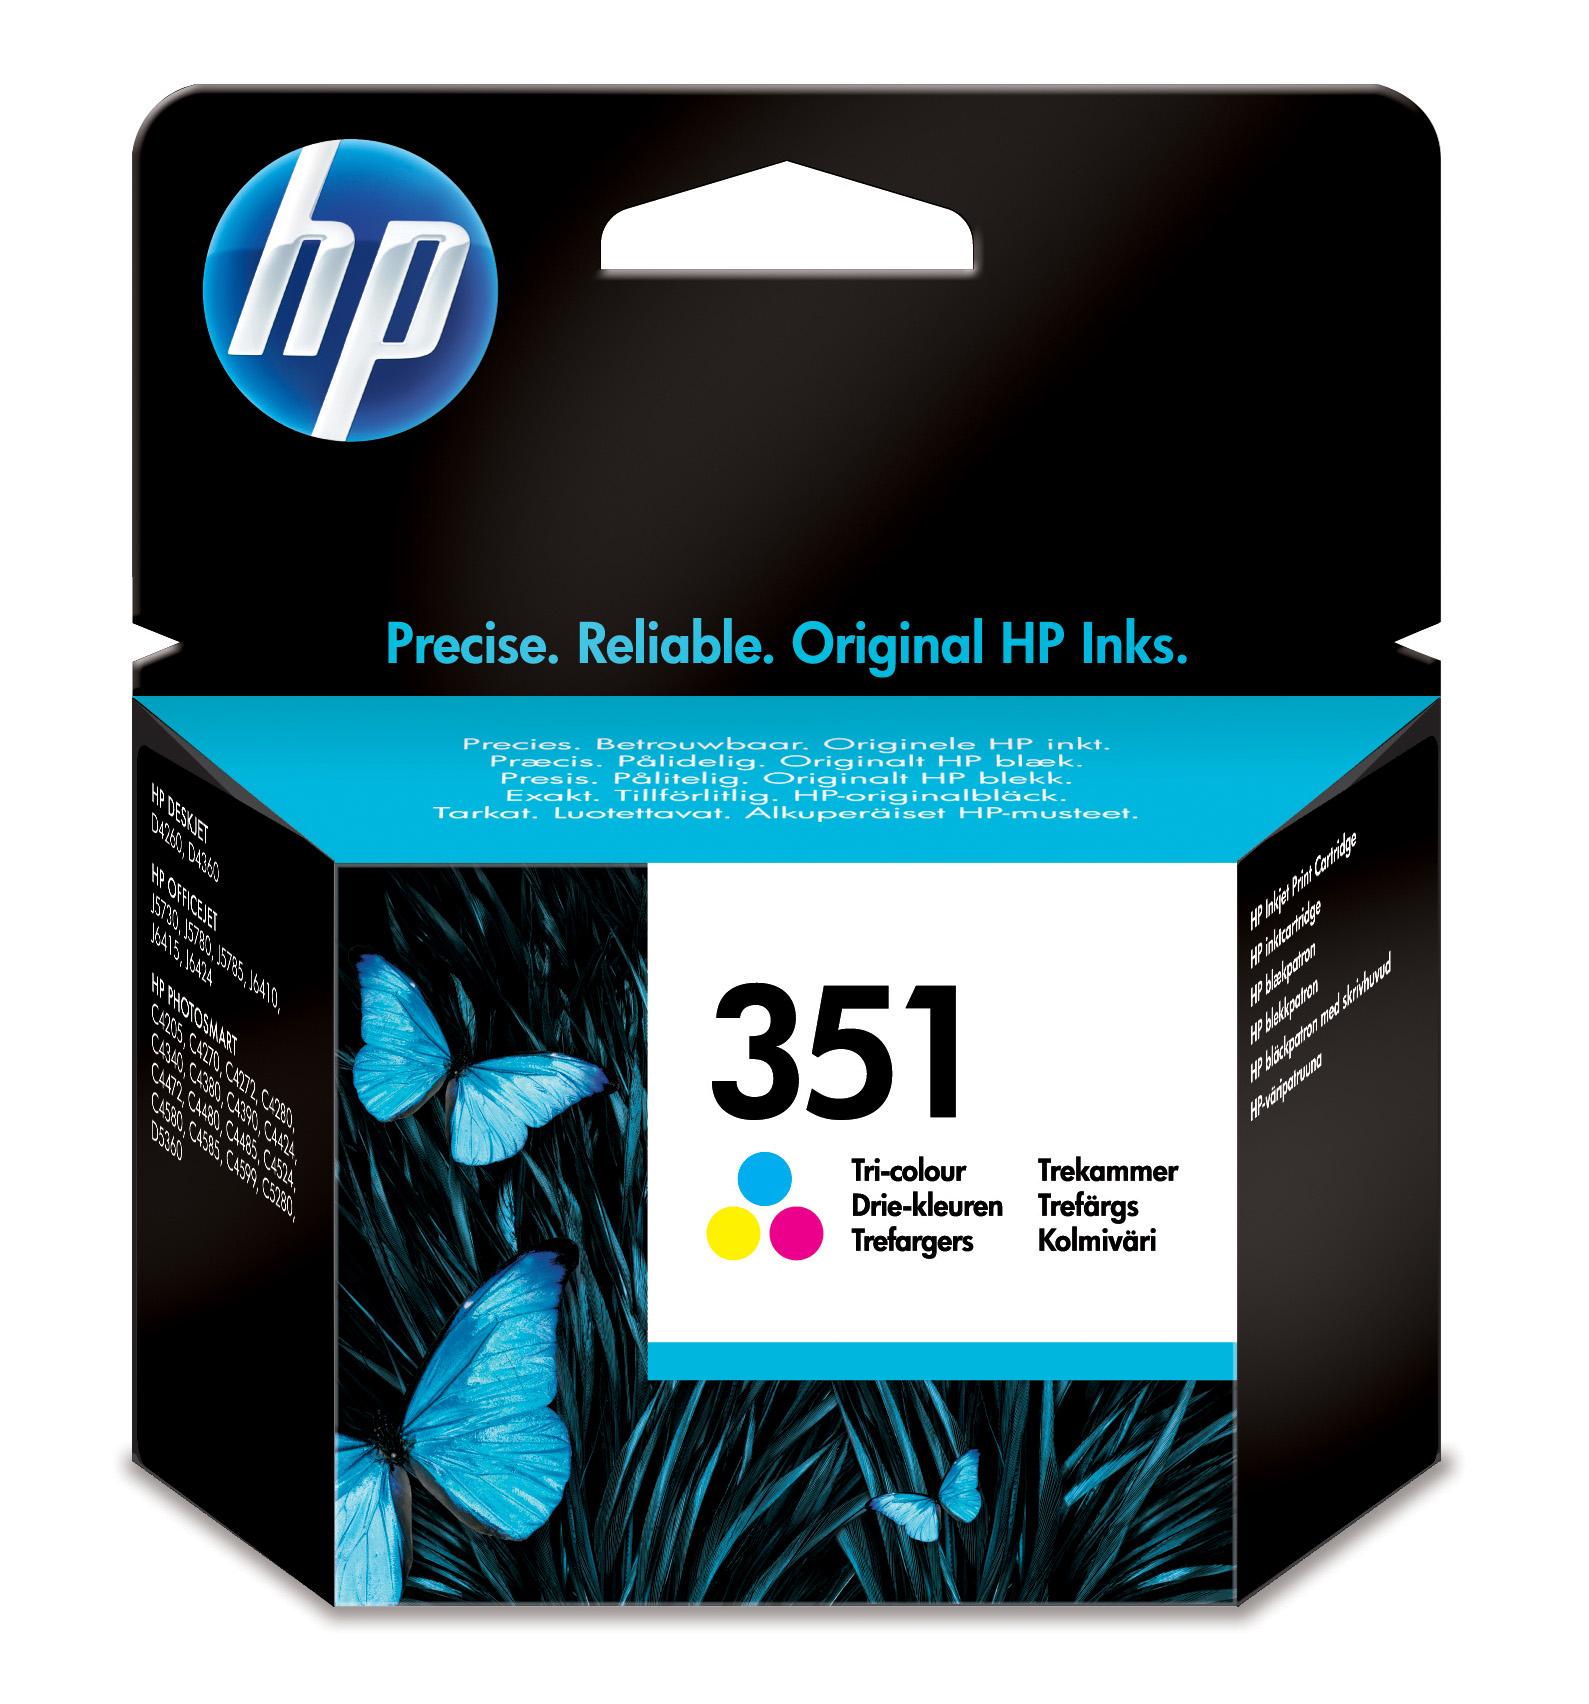 HP 351 Tri-color Inkjet Print Cartridge Original Cian, Magenta, Amarillo 1 pieza(s)